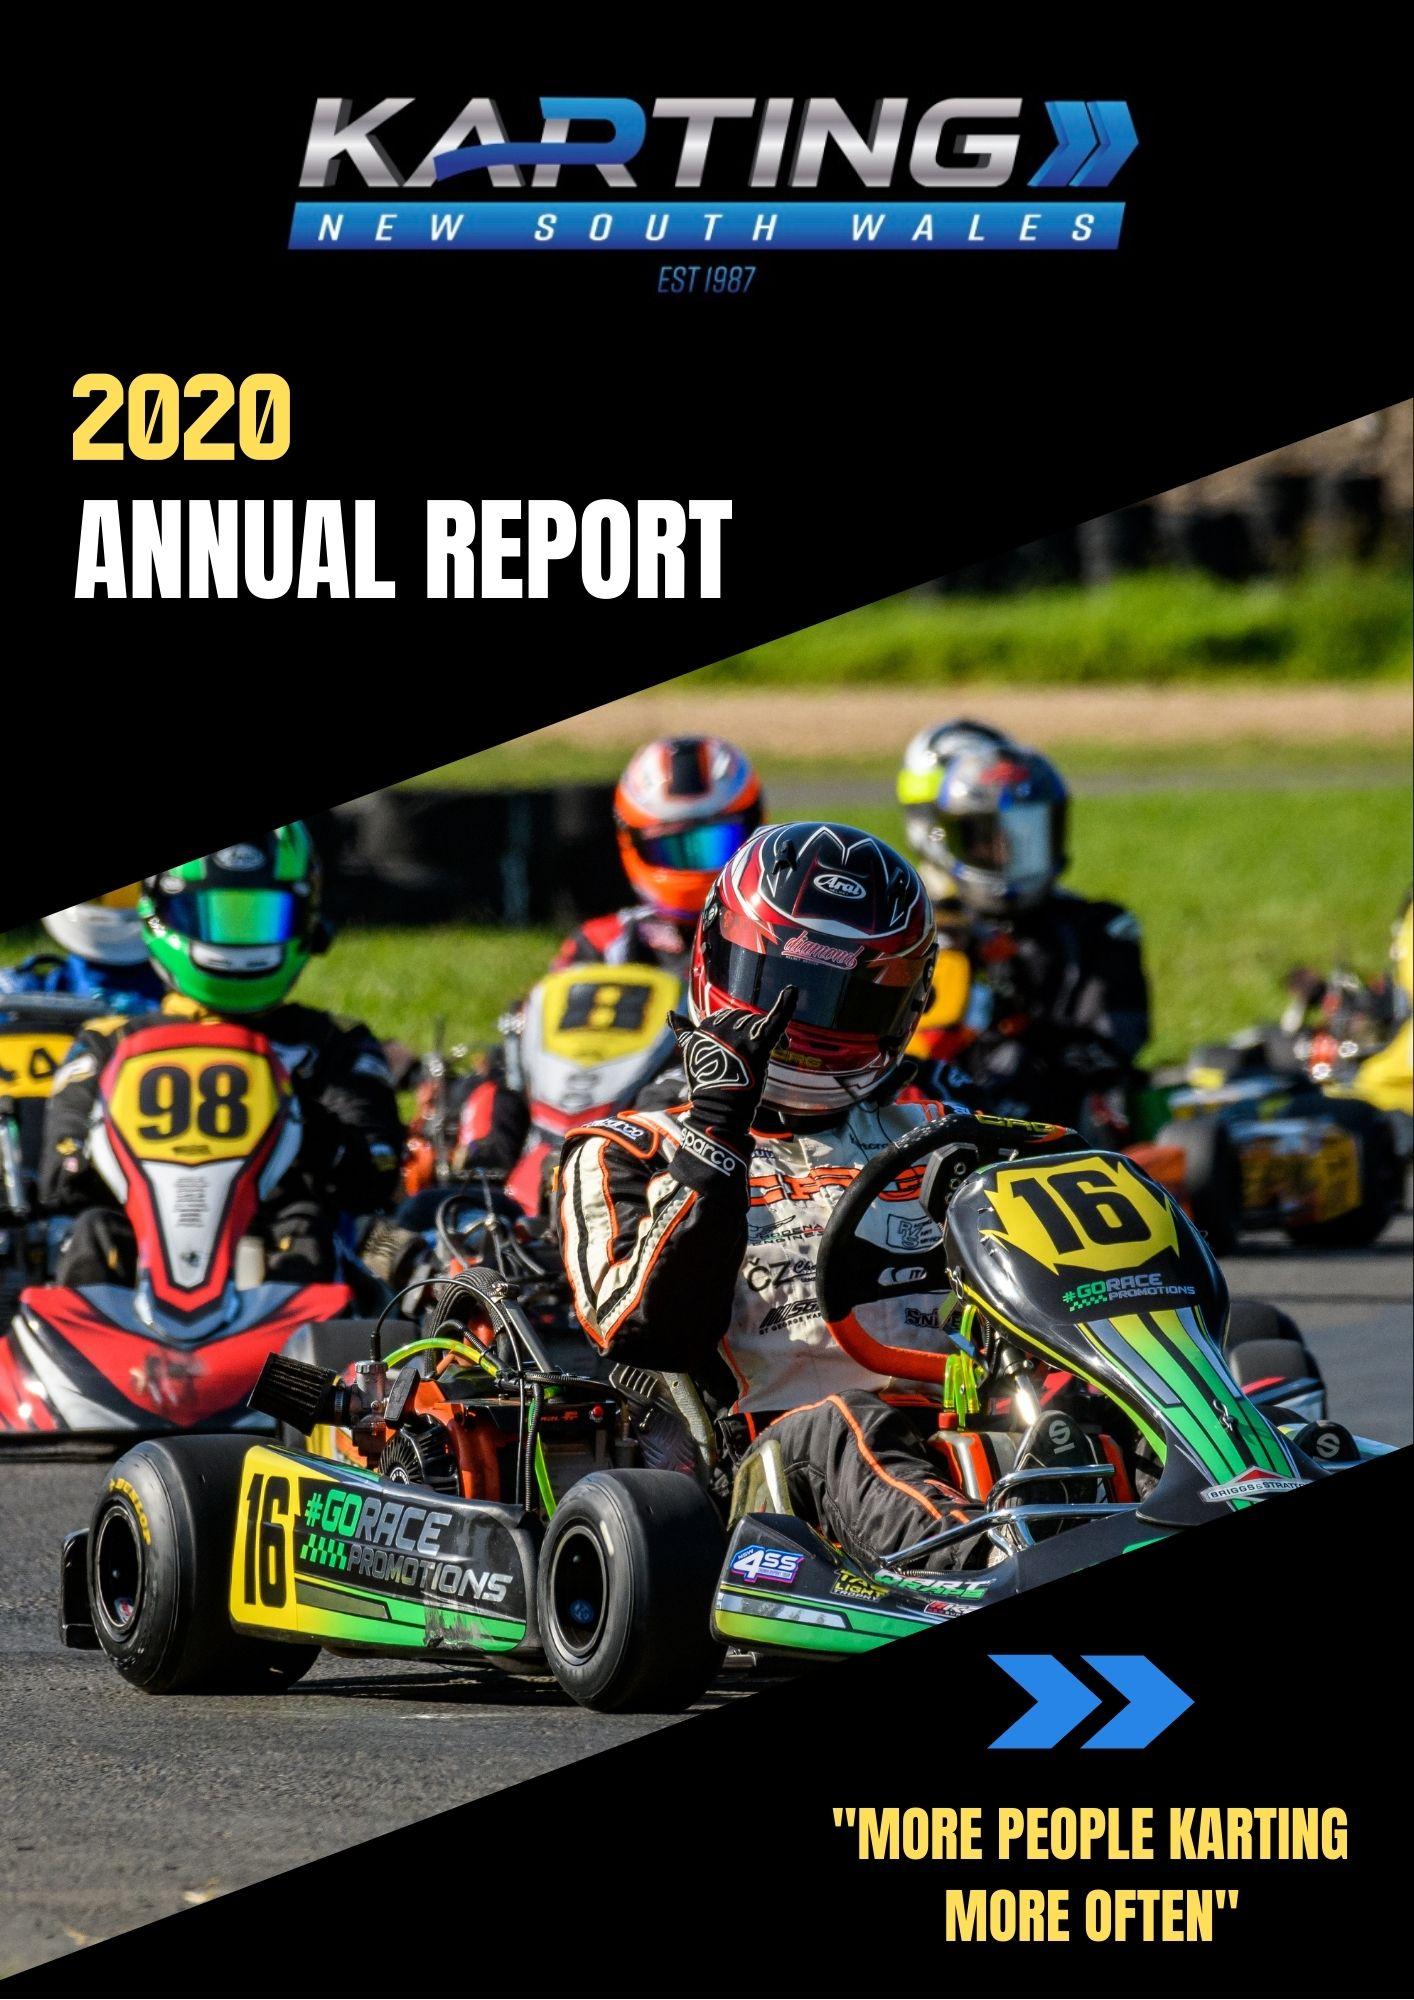 DRAFT KNSW ANNUAL REPORT